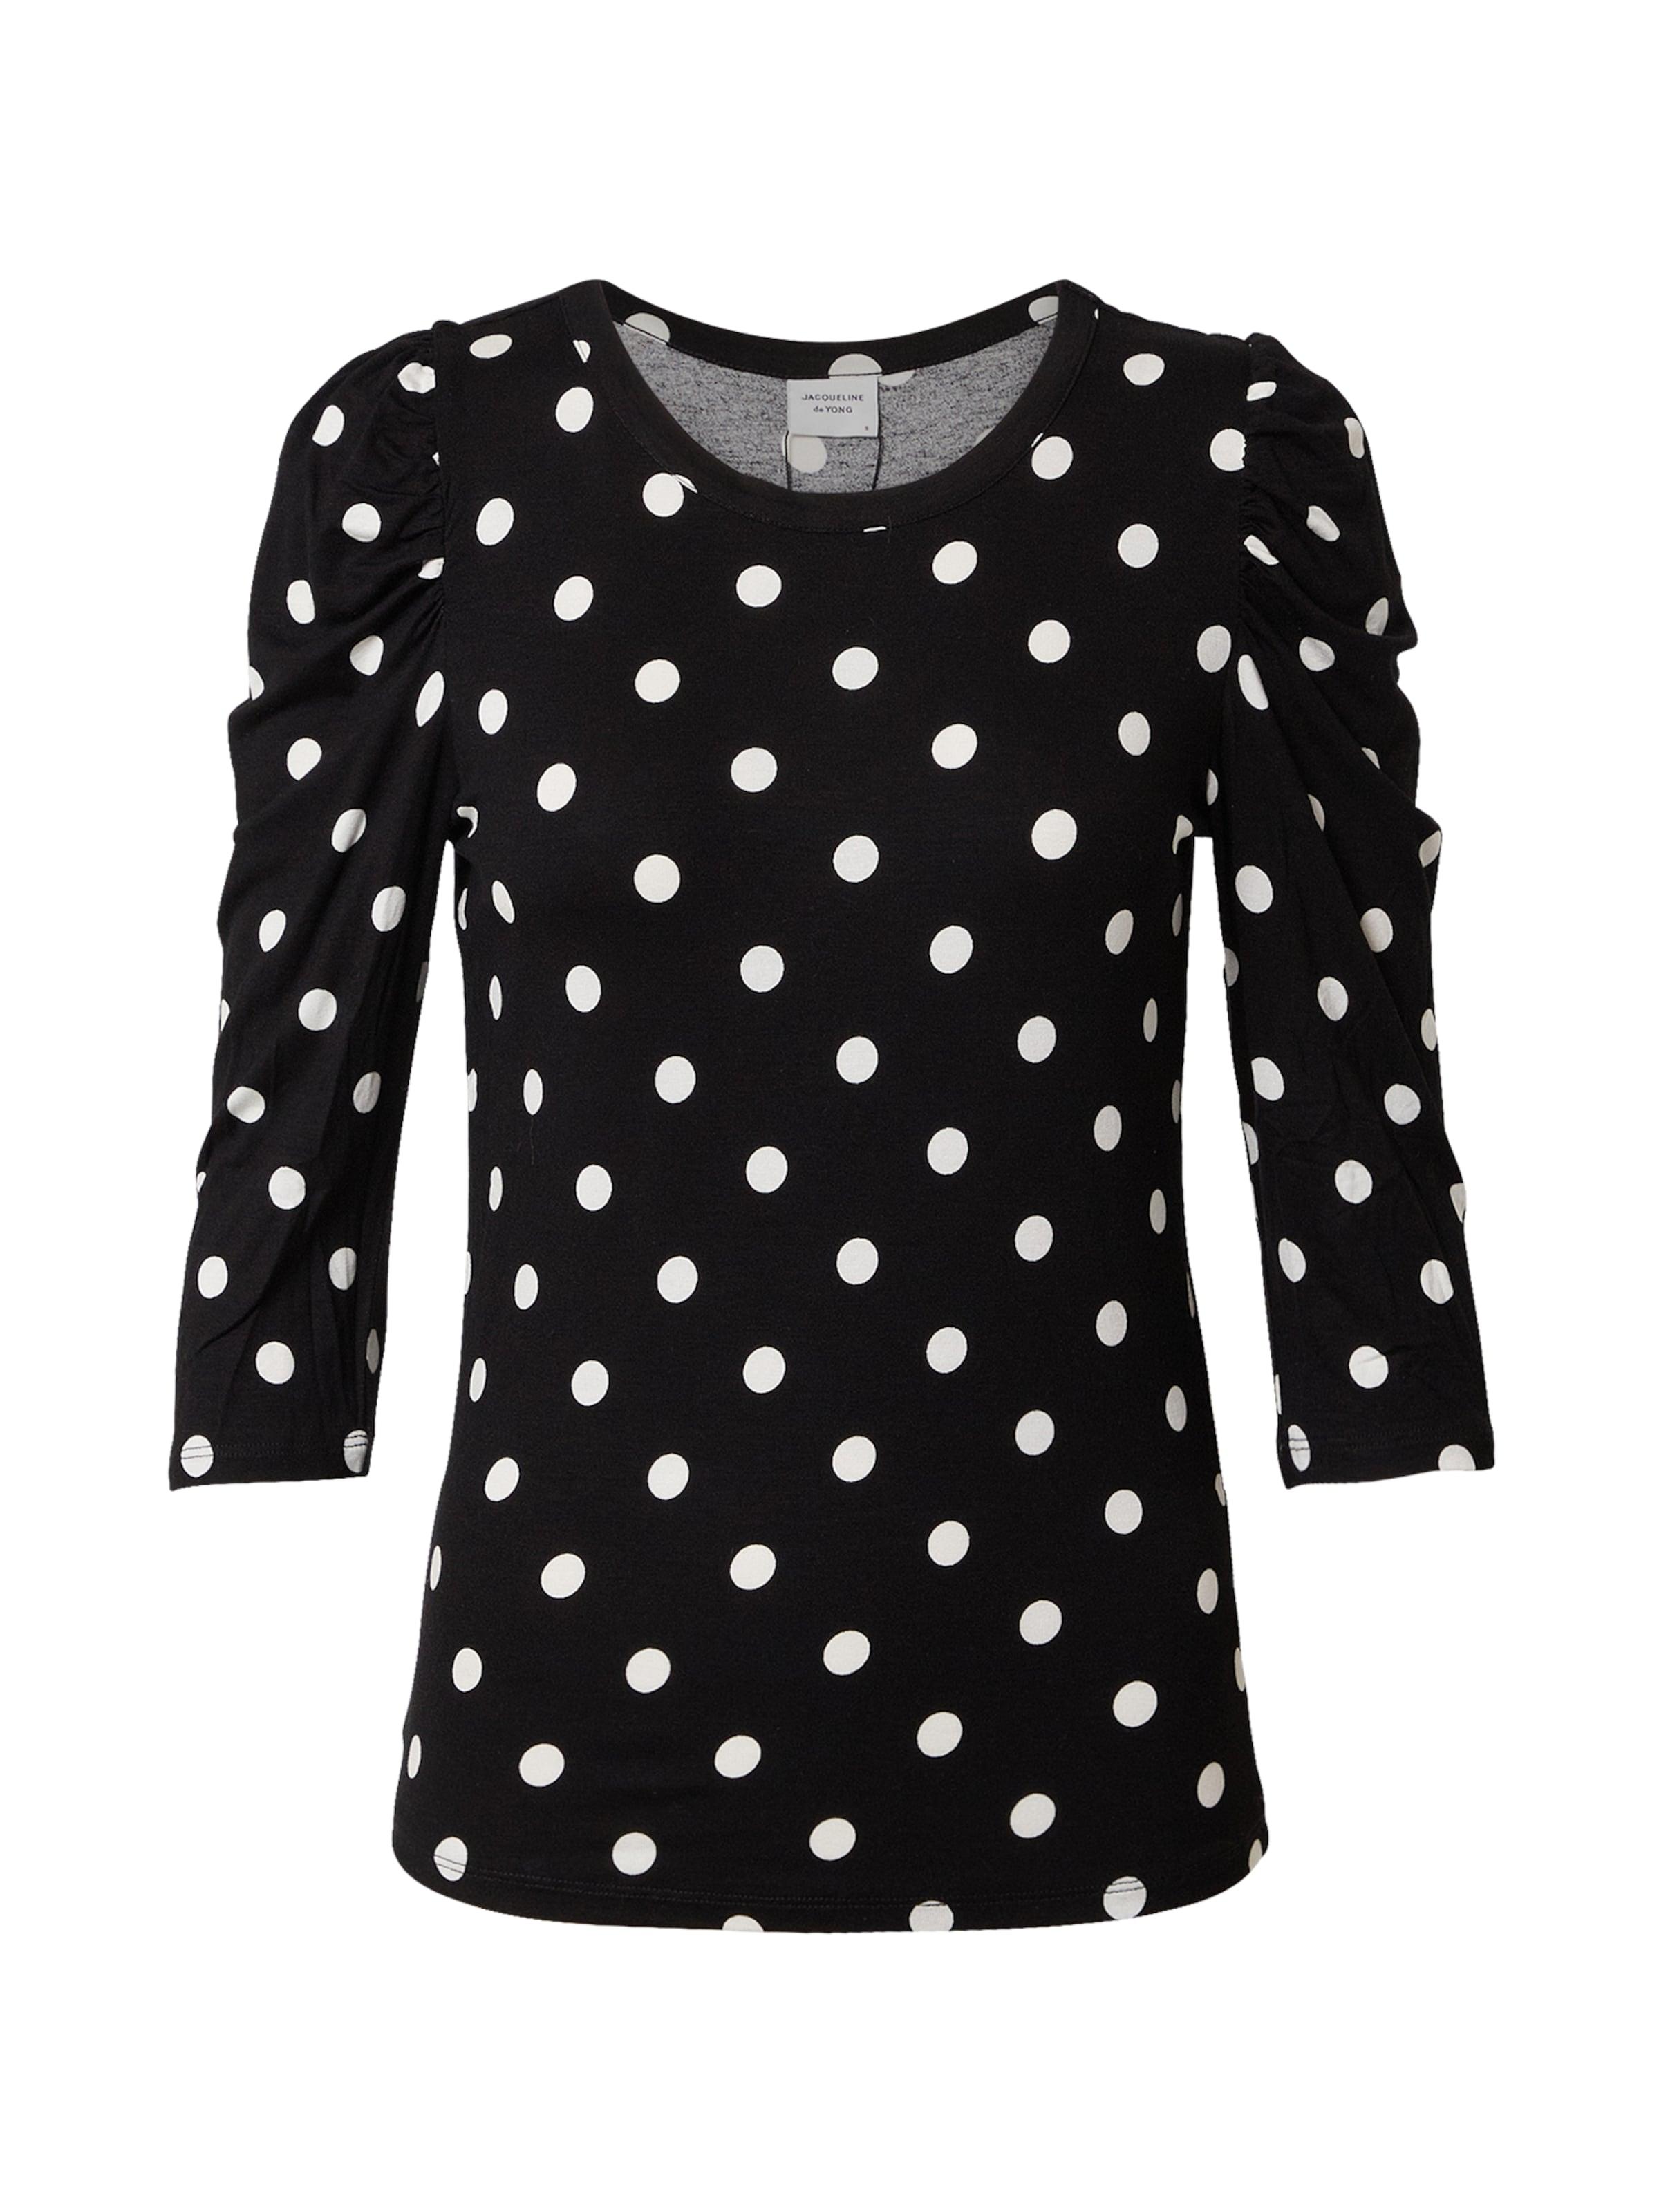 JACQUELINE de YONG Póló 'Hailey' fekete / fehér színben